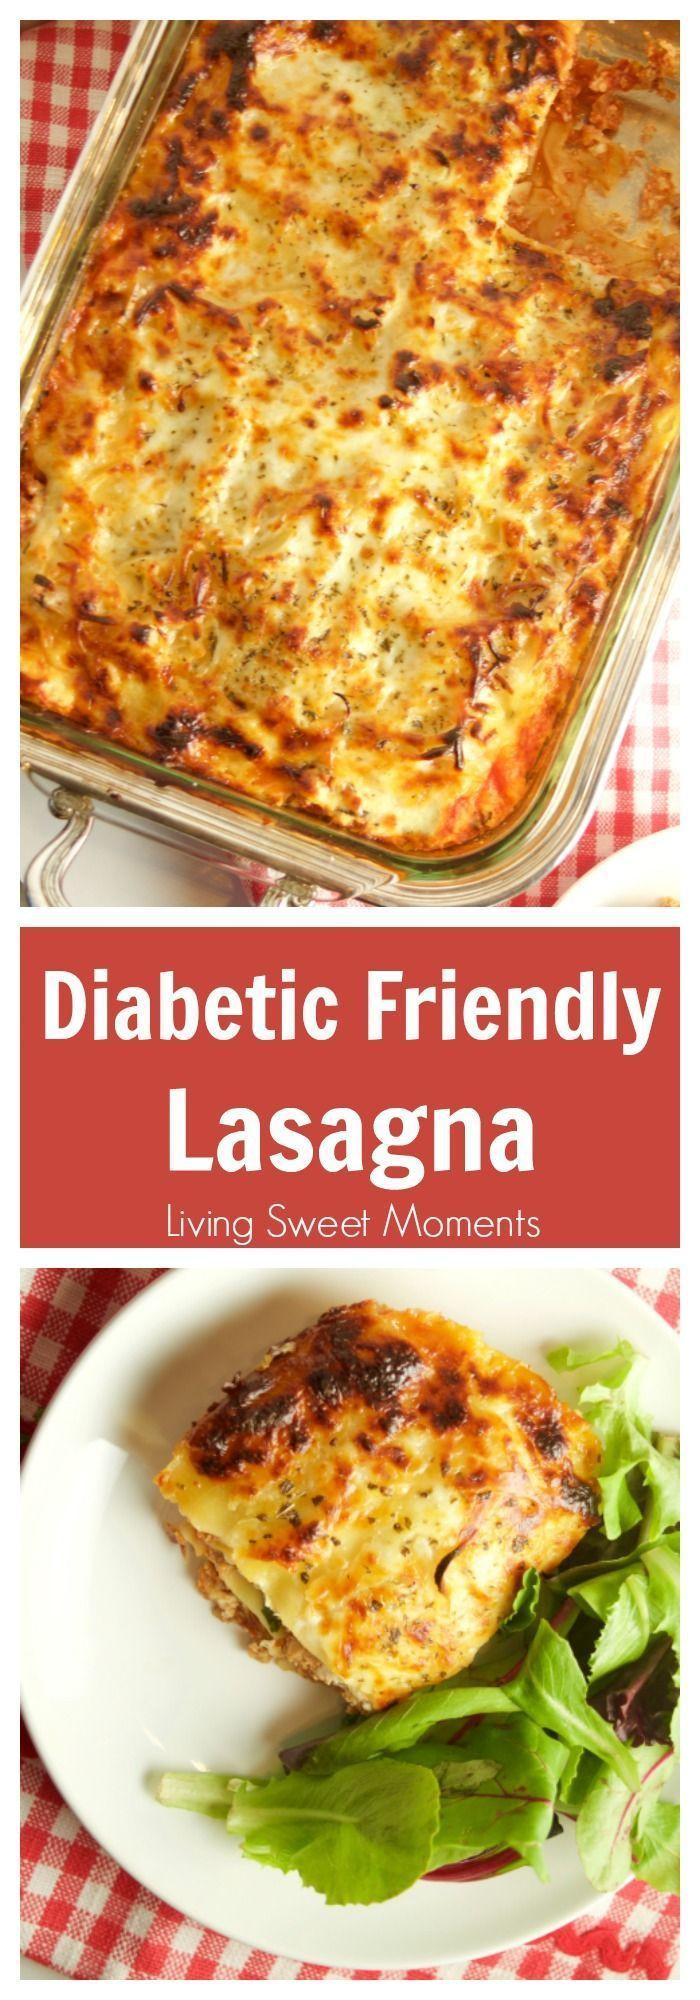 Healthy Diabetic Dinners  100 Diabetic Dinner Recipes on Pinterest